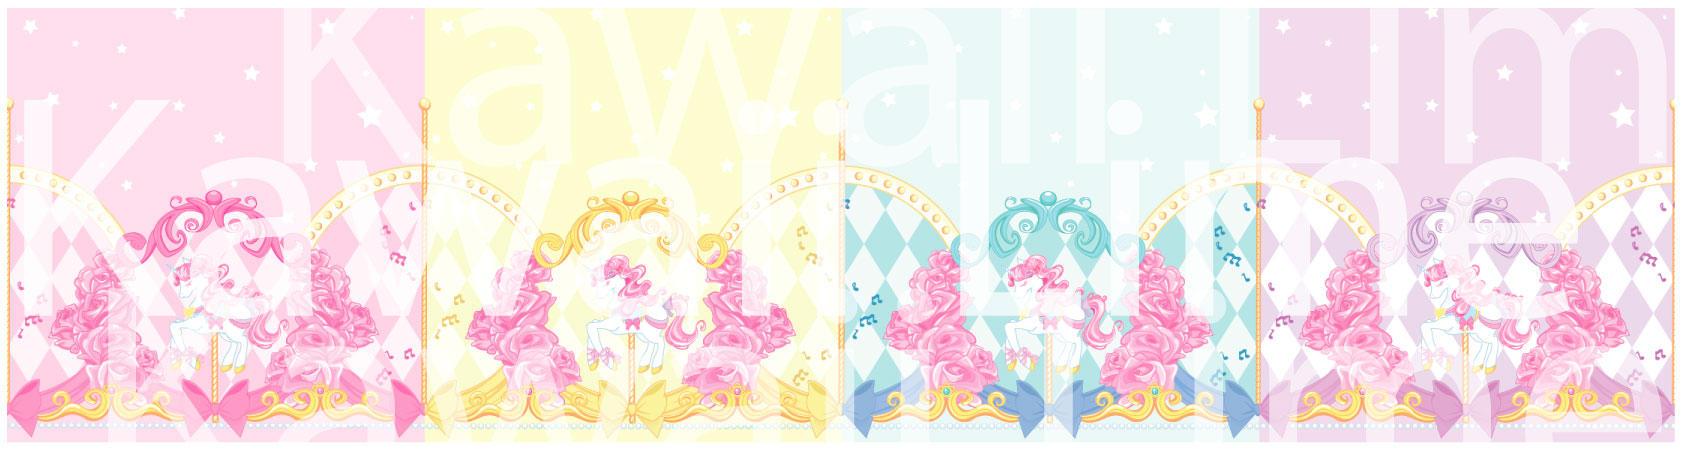 Dream of the starlight rose carnival